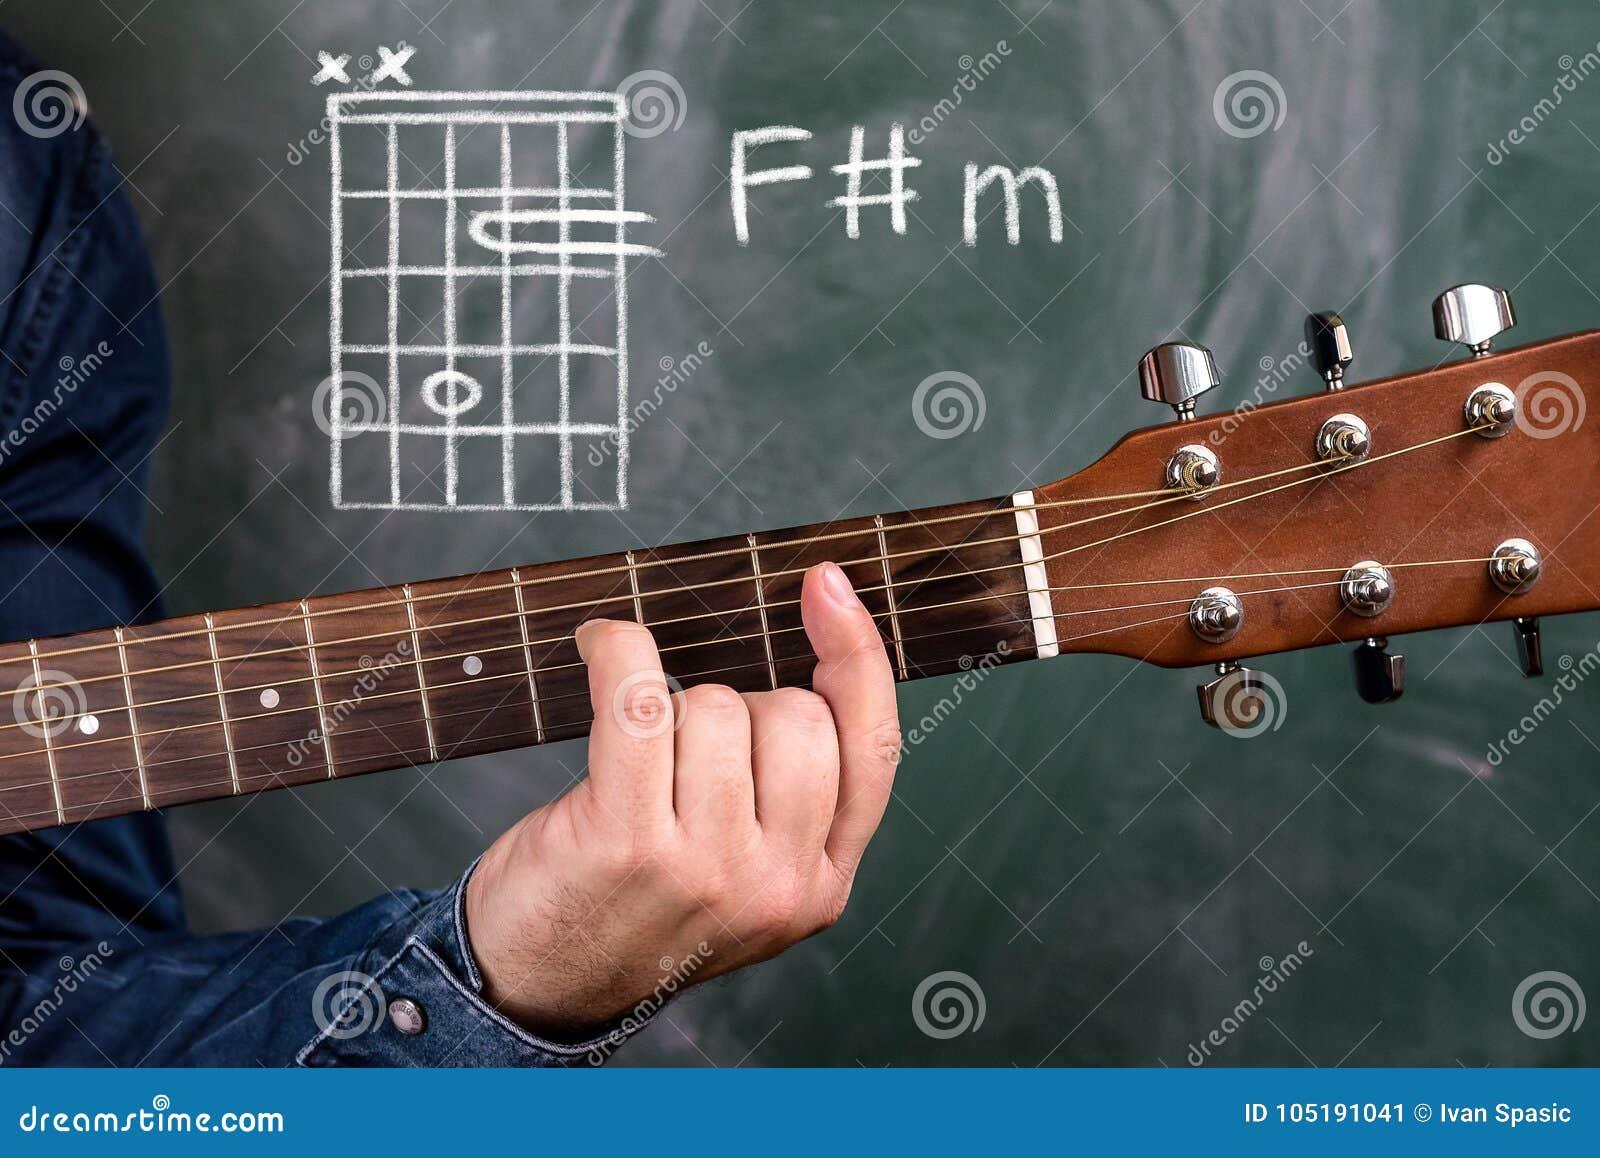 Man Playing Guitar Chords Displayed On A Blackboard Chord F Sharp M